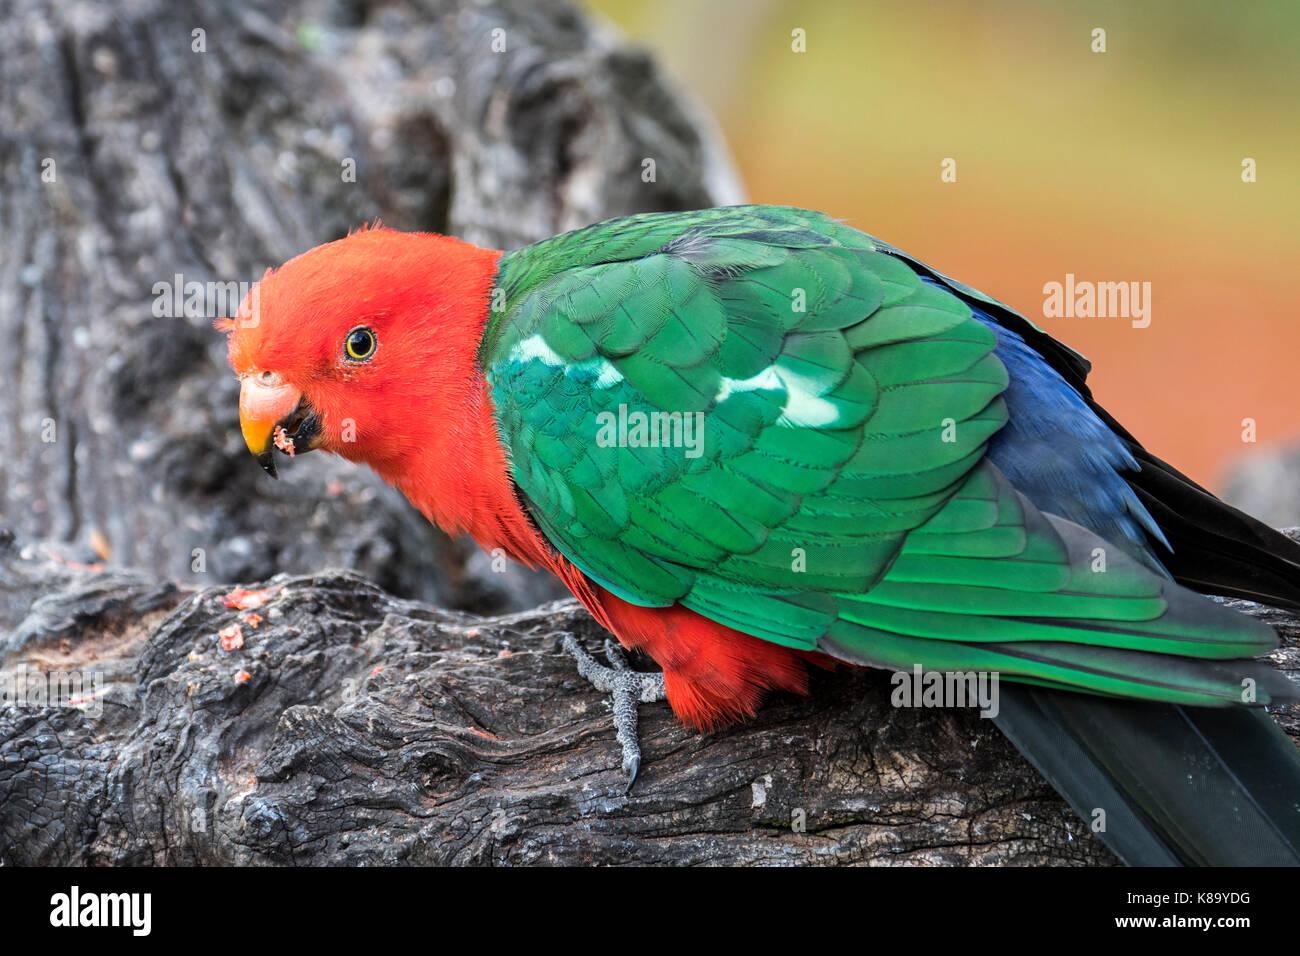 Australian king parrot (Alisterus scapularis) male, native to eastern Australia - Stock Image